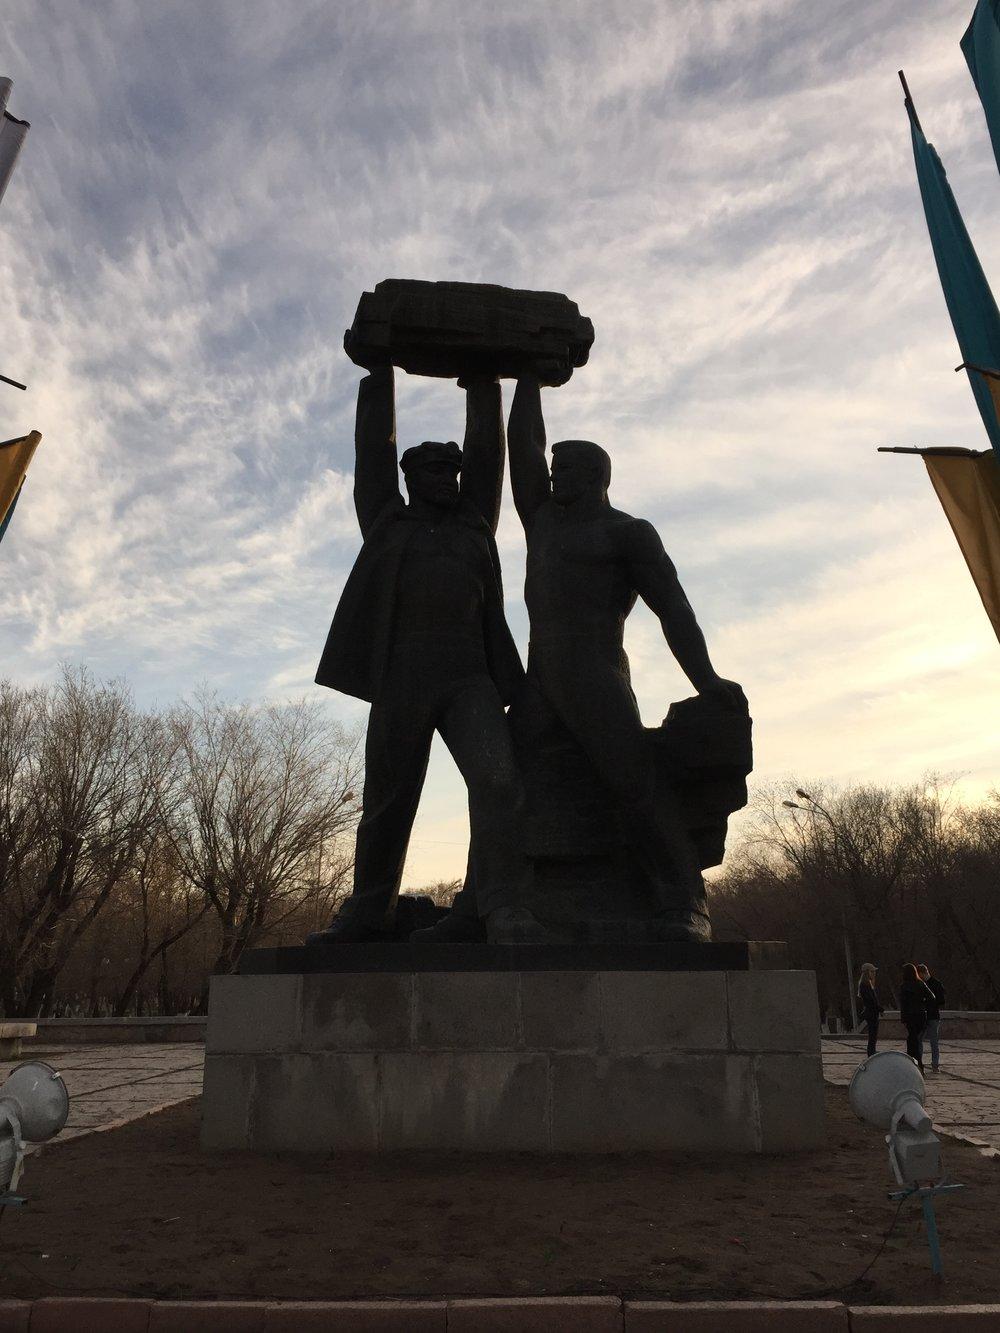 Famous statue in Karanganda, represents unity between Russia & Kazakhstan